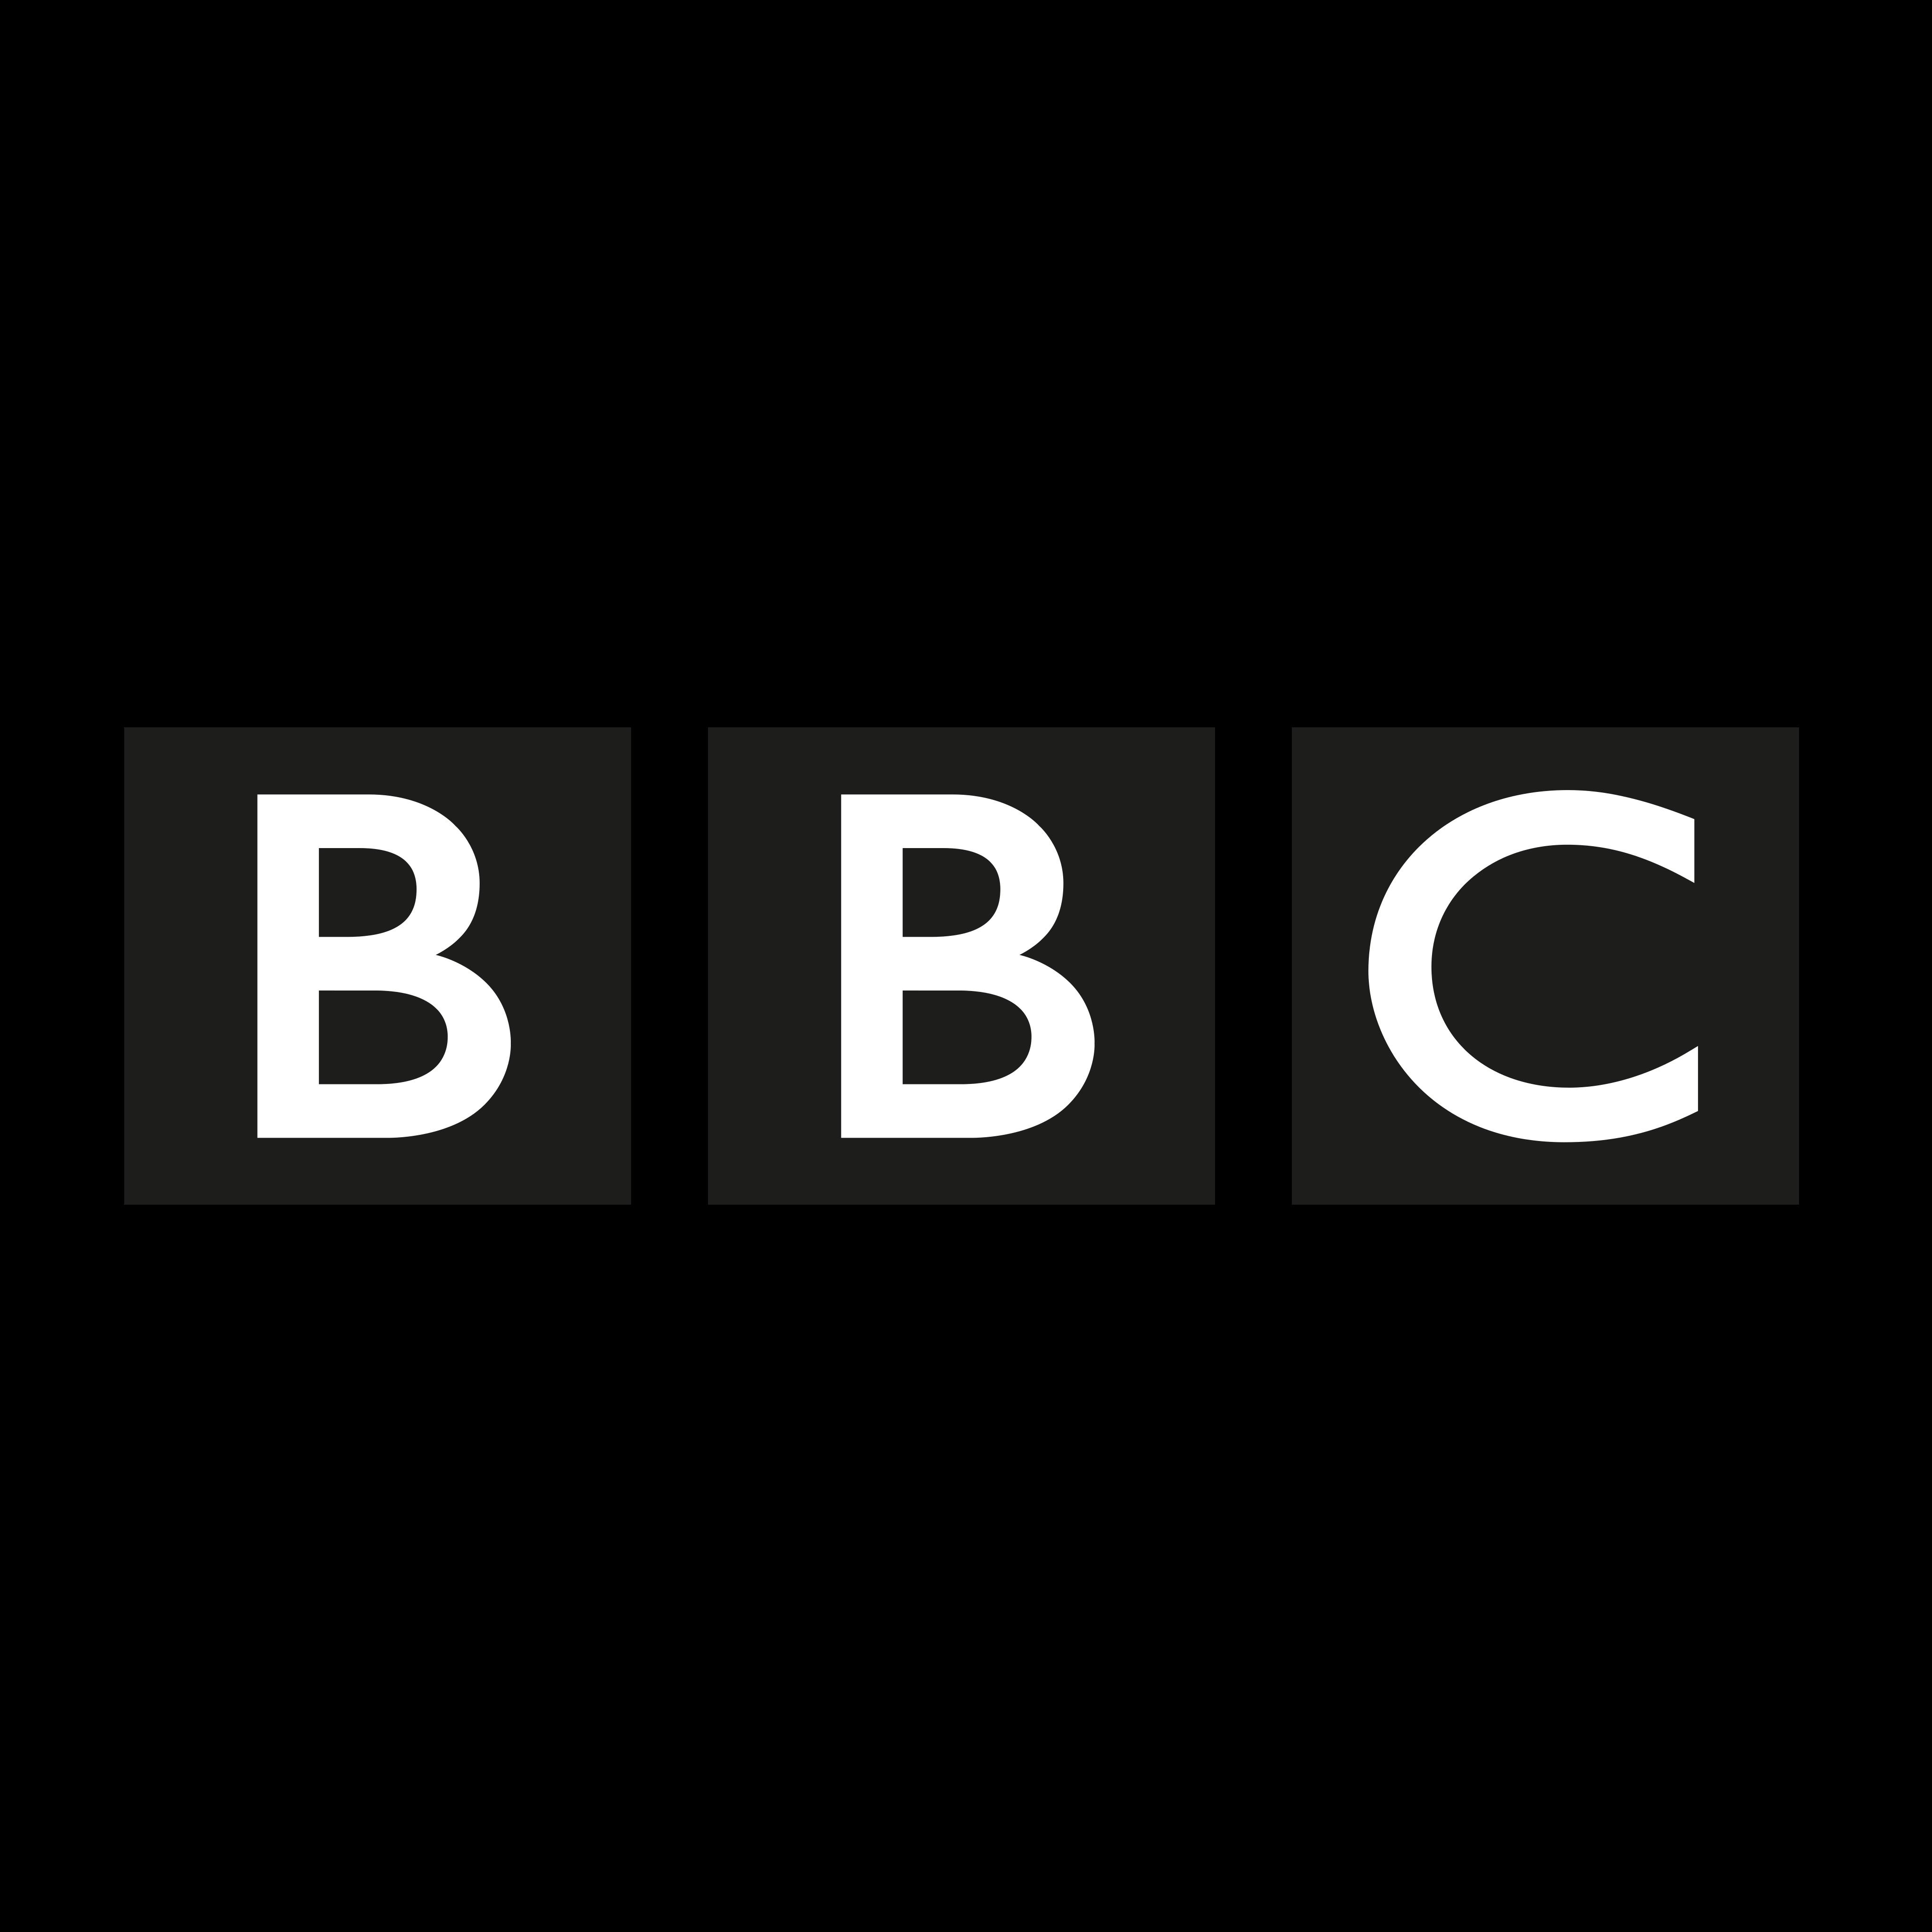 bbc logo 0 - BBC Logo